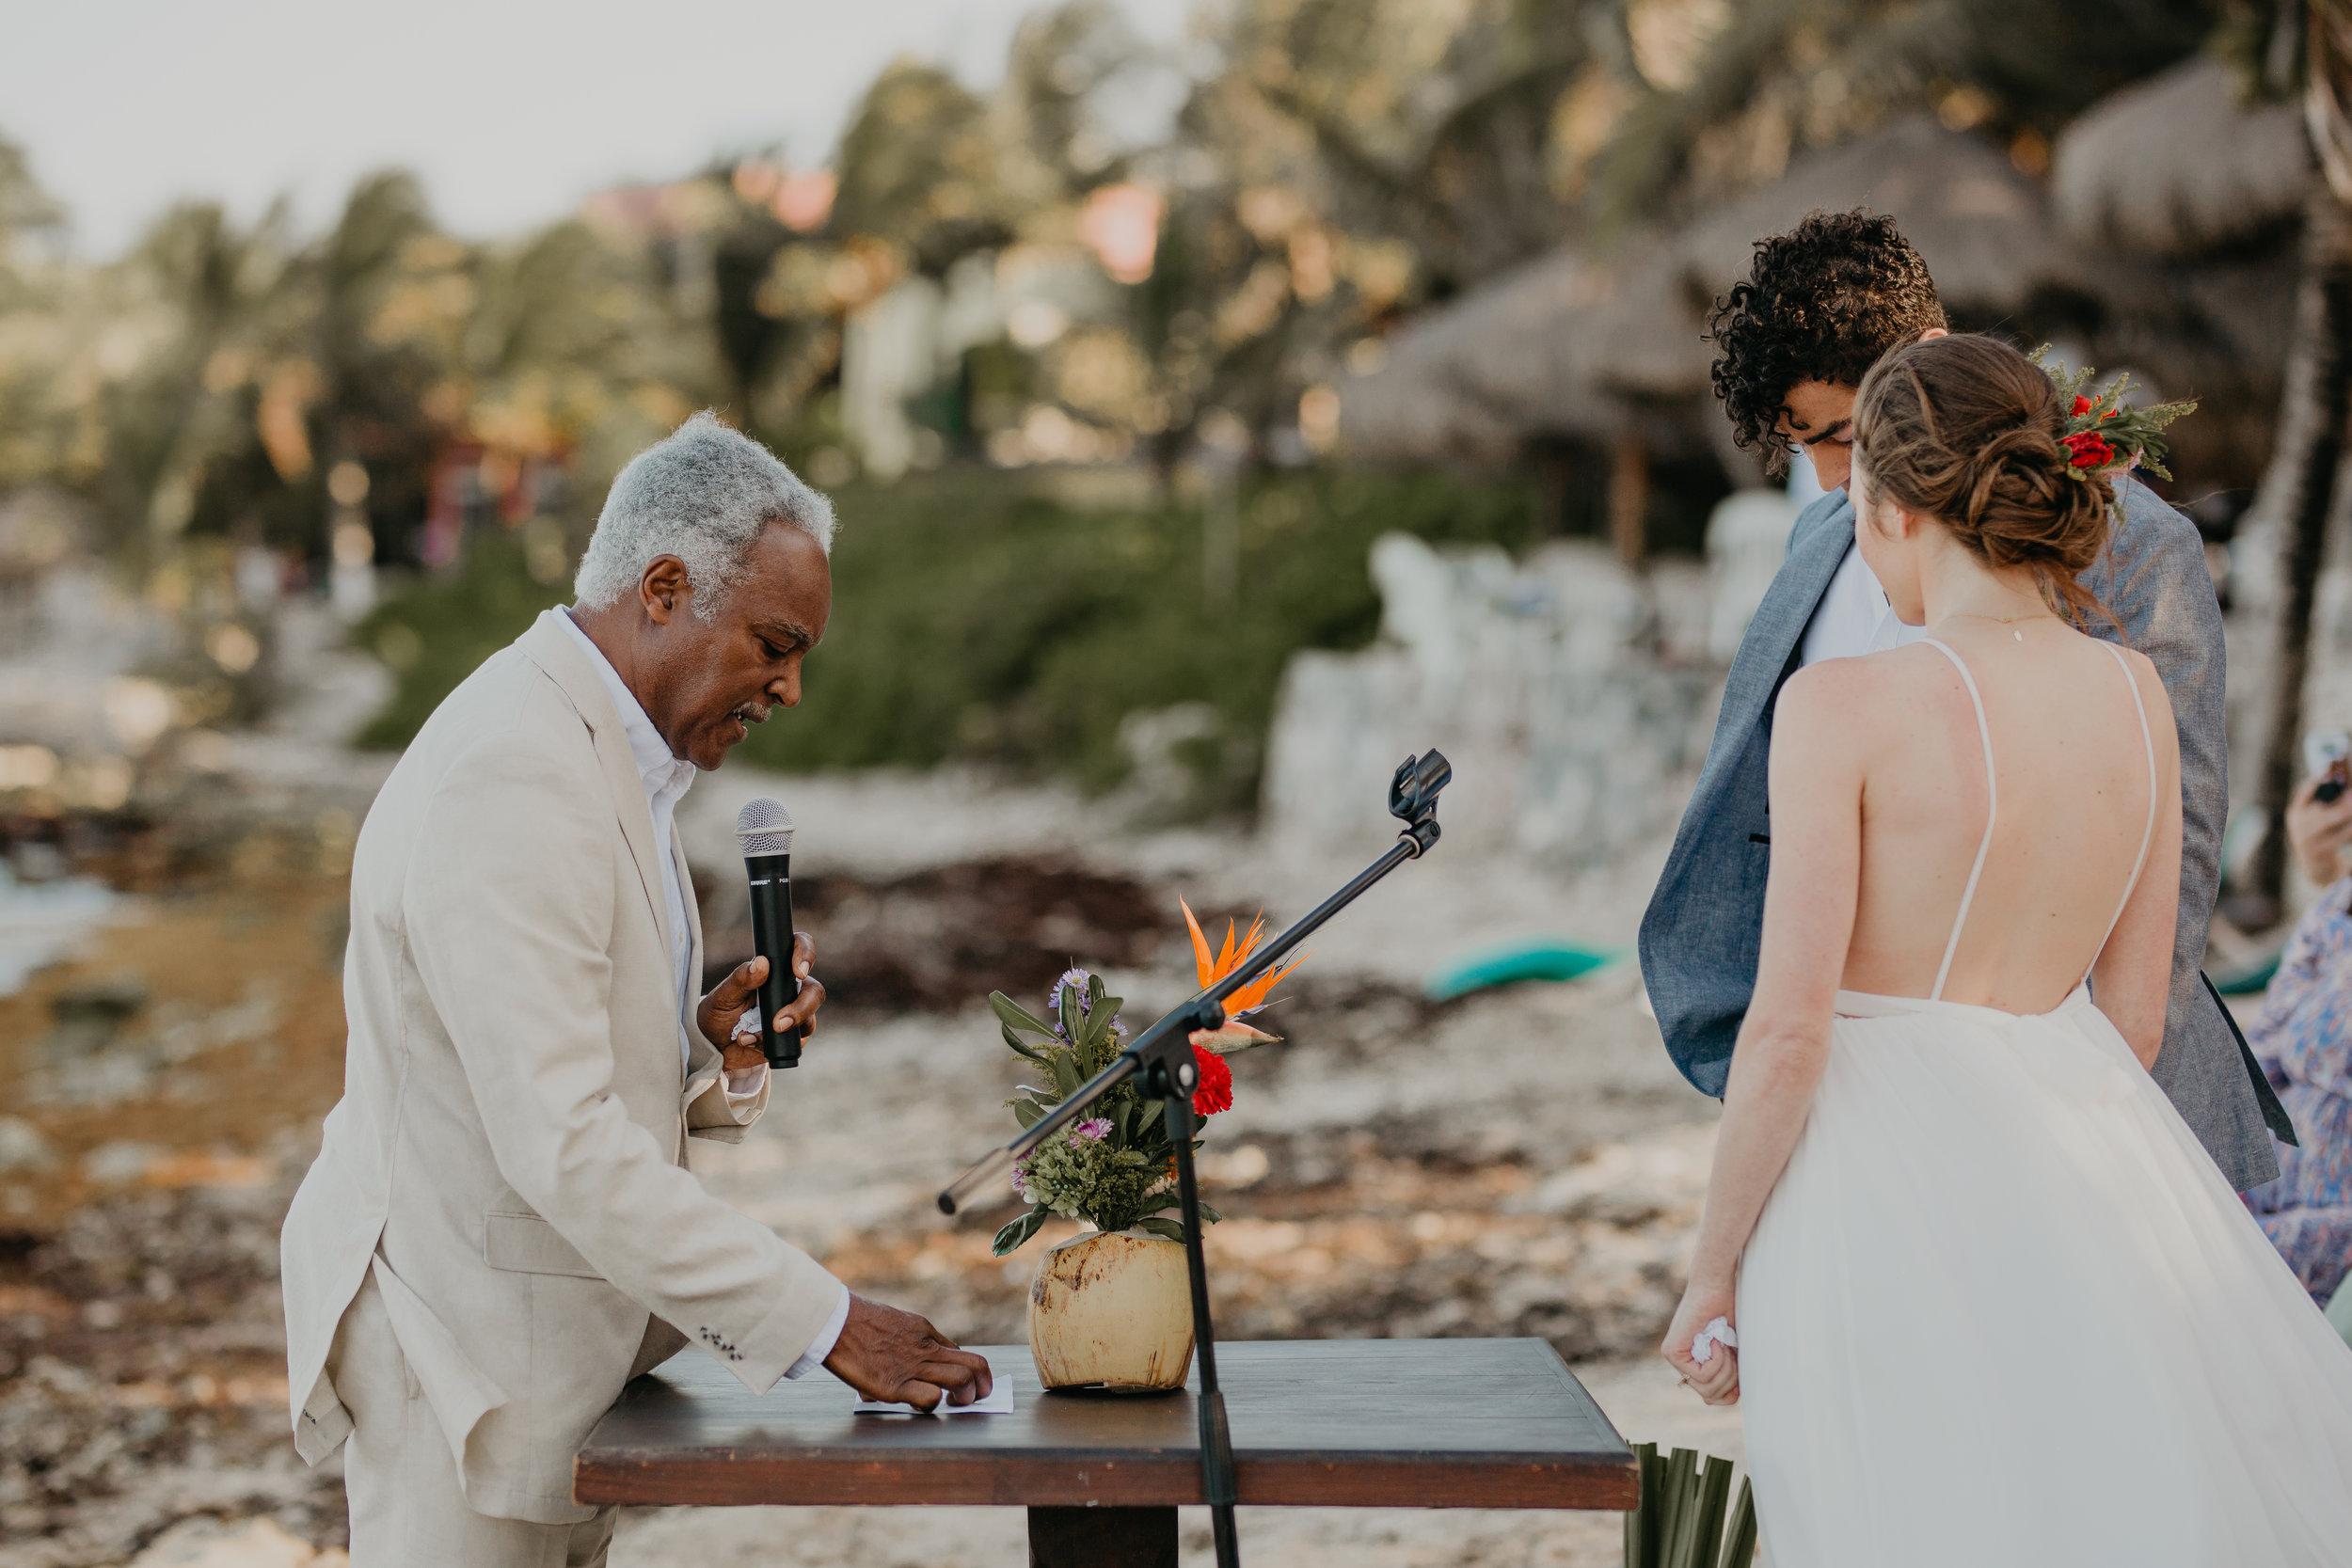 Nicole-Daacke-Photography-beachfront-akumal-destionation-wedding-tulum-mexico-elopement-photographer-destination-wedding-inspiration-sunset-champagne-pop-boho-bride-ocean-tropical-bohemian-tulum-wedding-photos-168.jpg